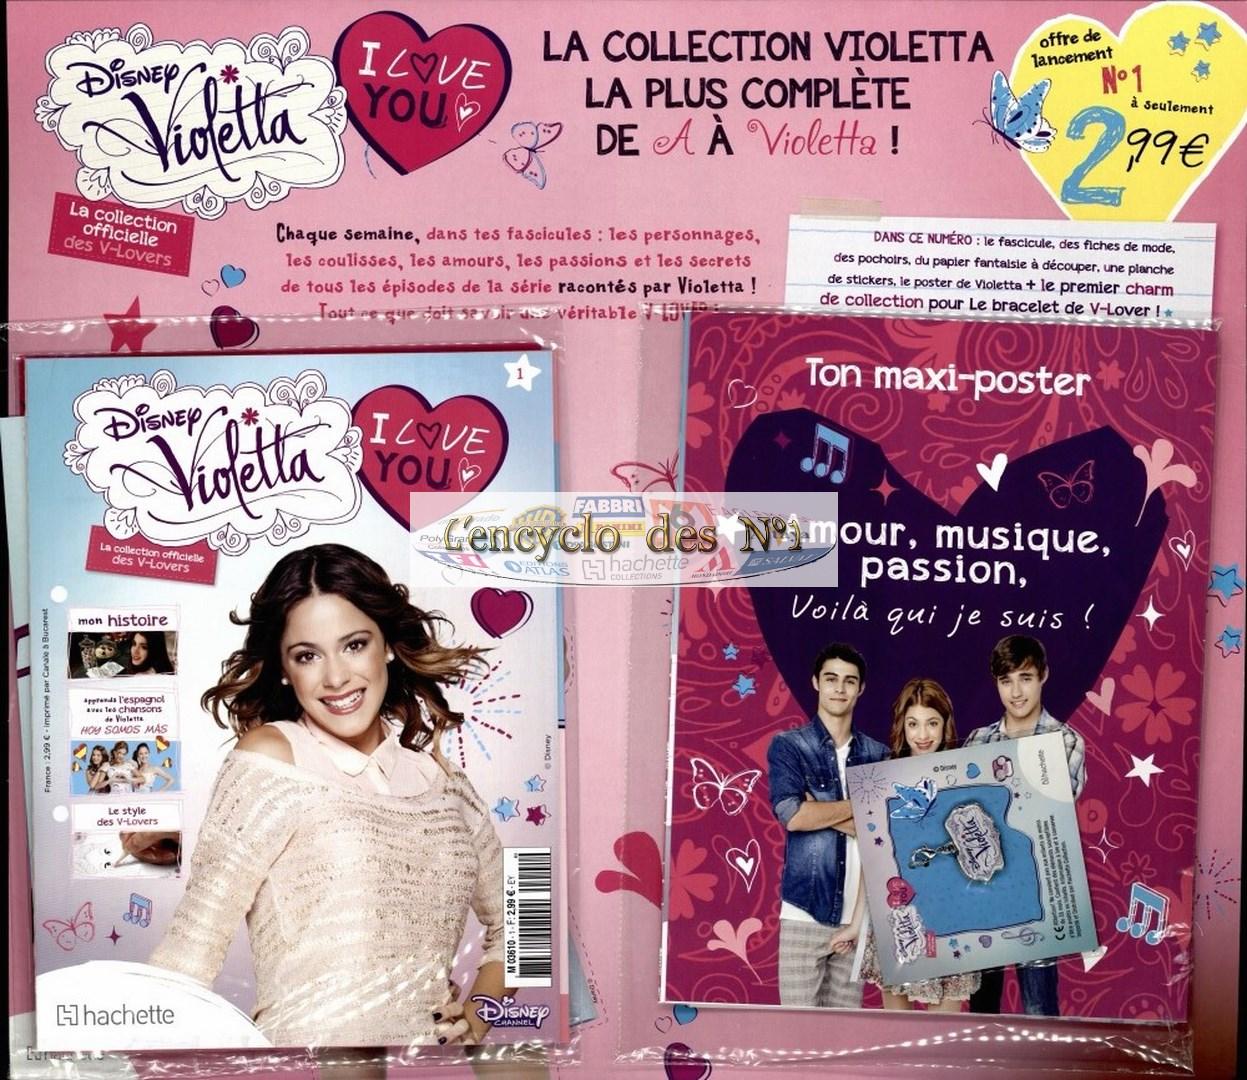 N° 1 Disney Violetta I love You - Collection Hachette - Sept 2014 DwrAmIst30cY4zXudvCHKxmFfTw